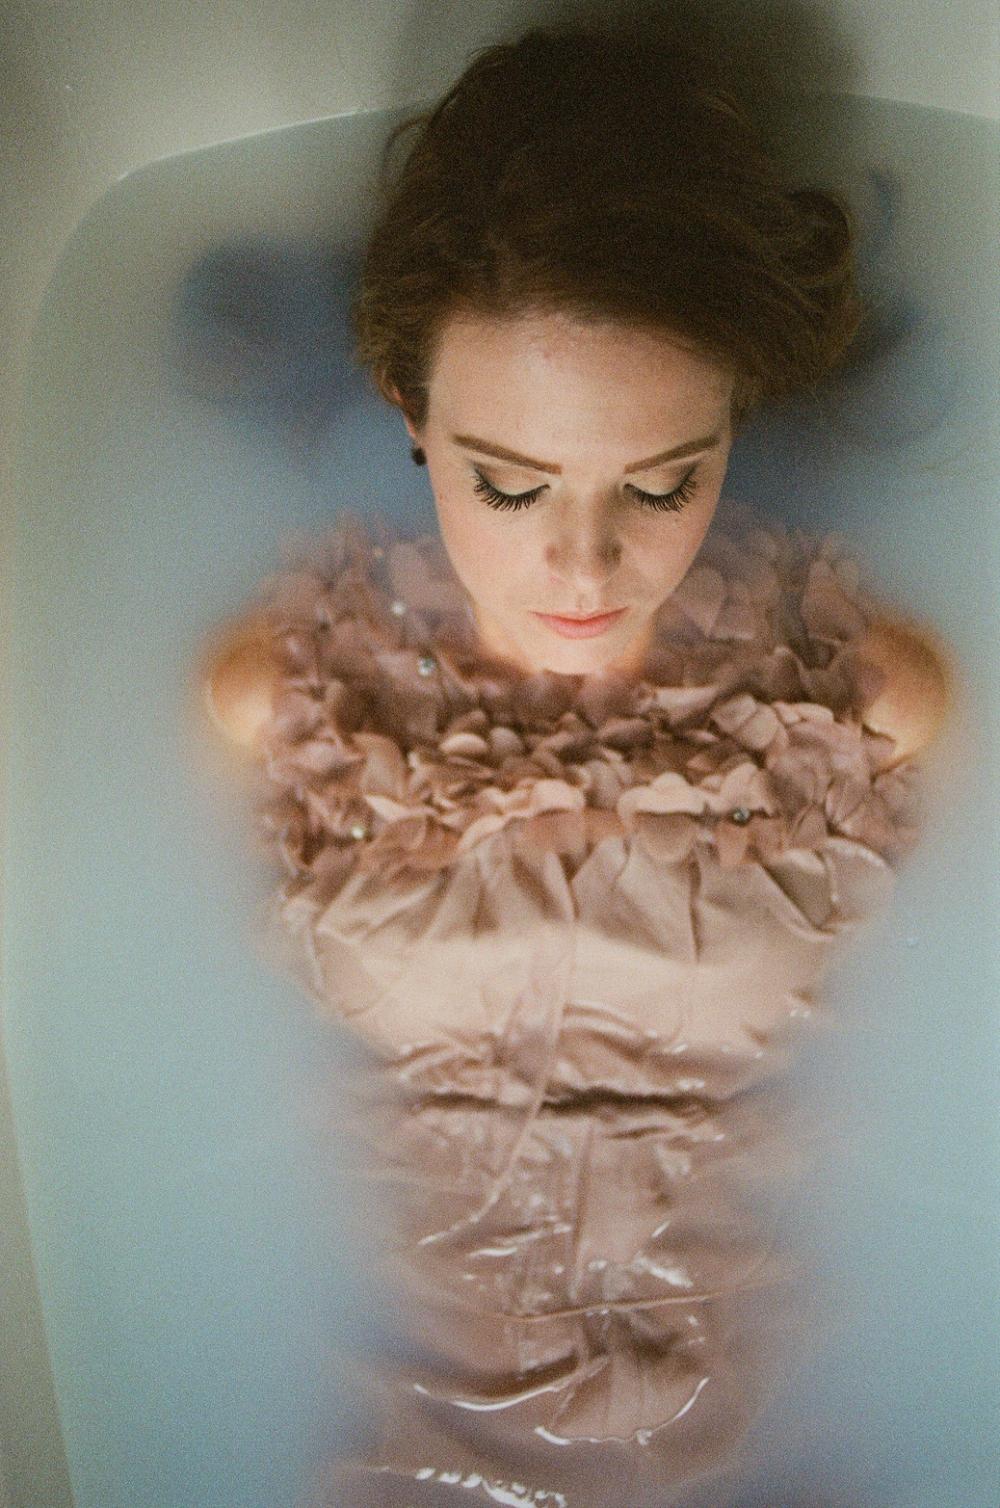 creative-film-photography-mermaidens-portrait-series-by-holly-cromer-04.jpg